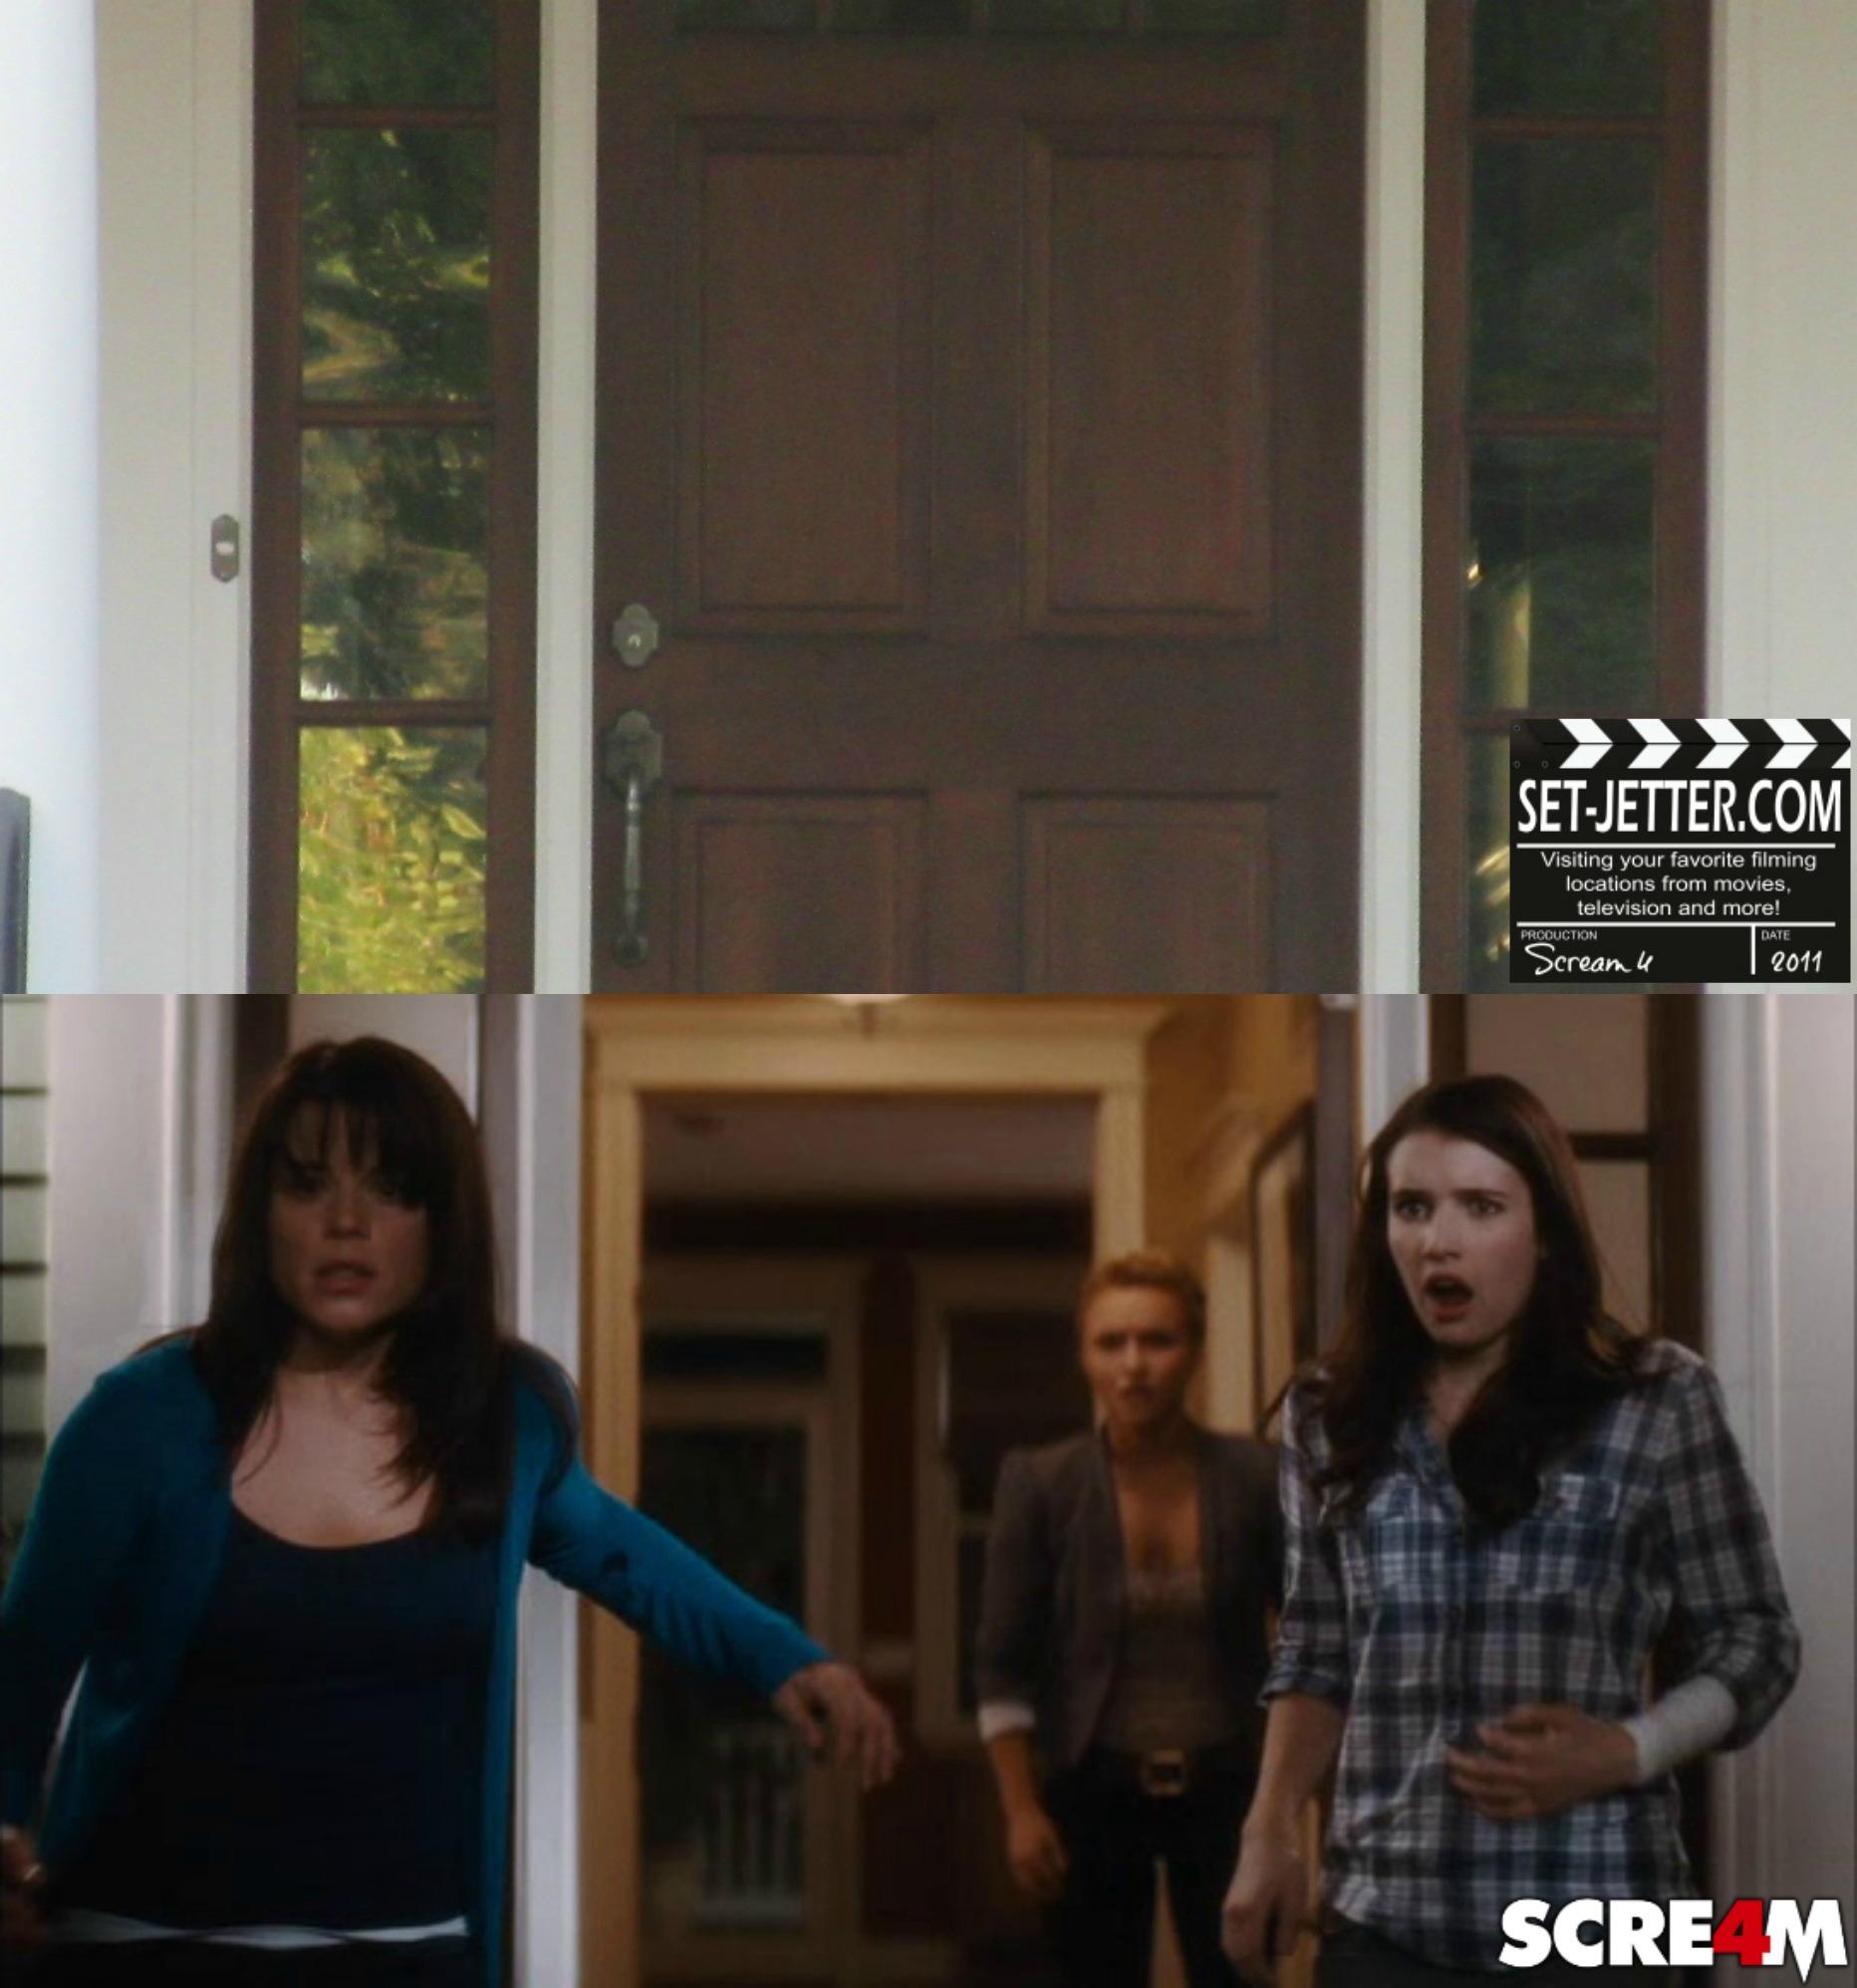 Scream4 comparison 144.jpg